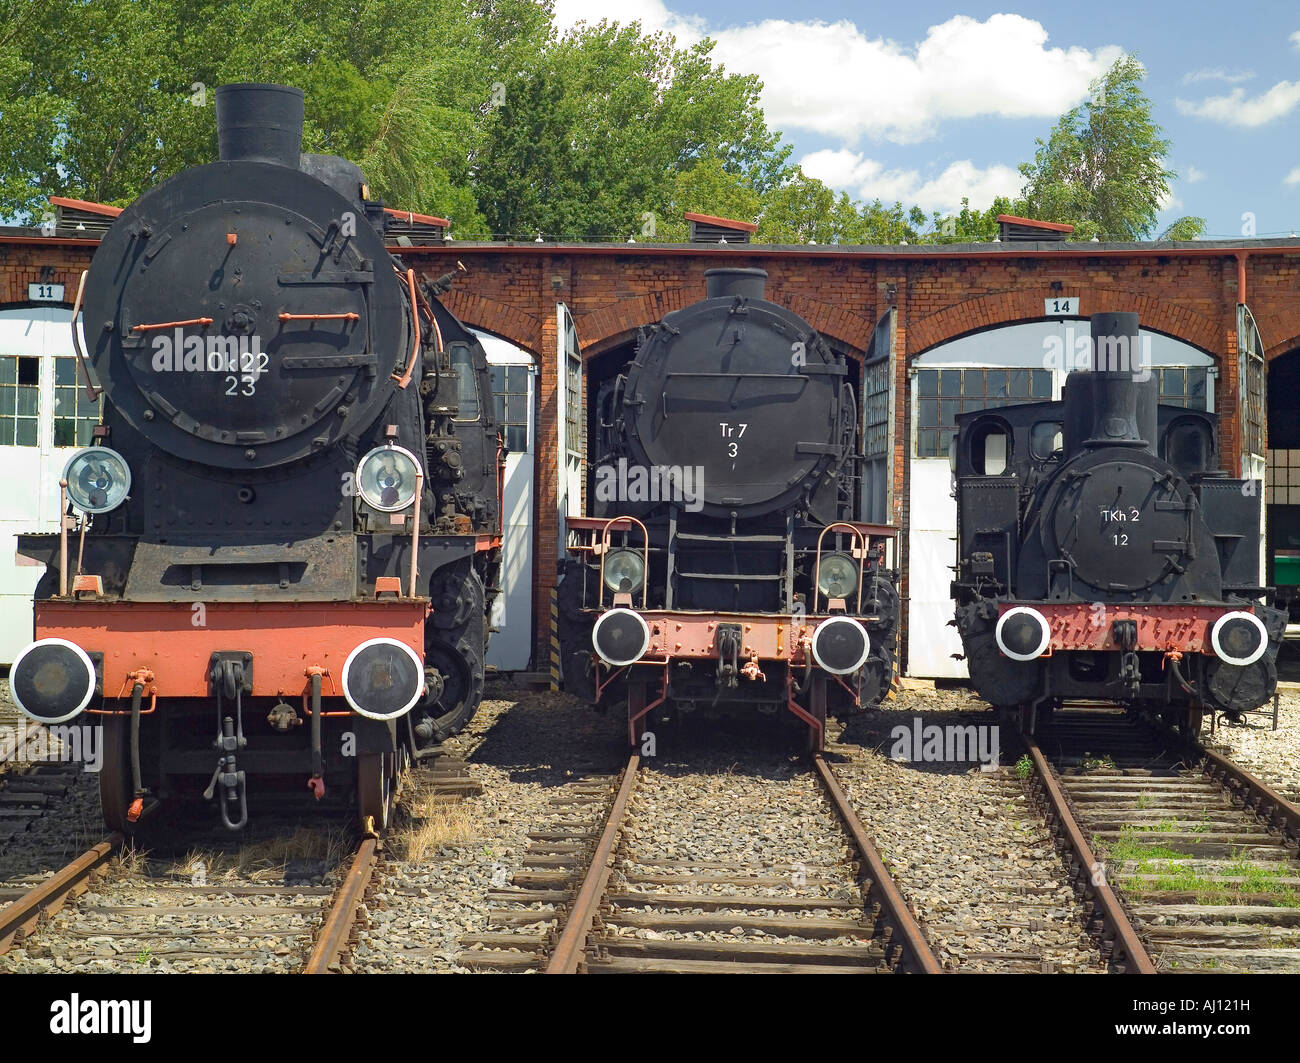 Steam engines locomotives Ok 22,Tr 7and Tkh 2 - Stock Image